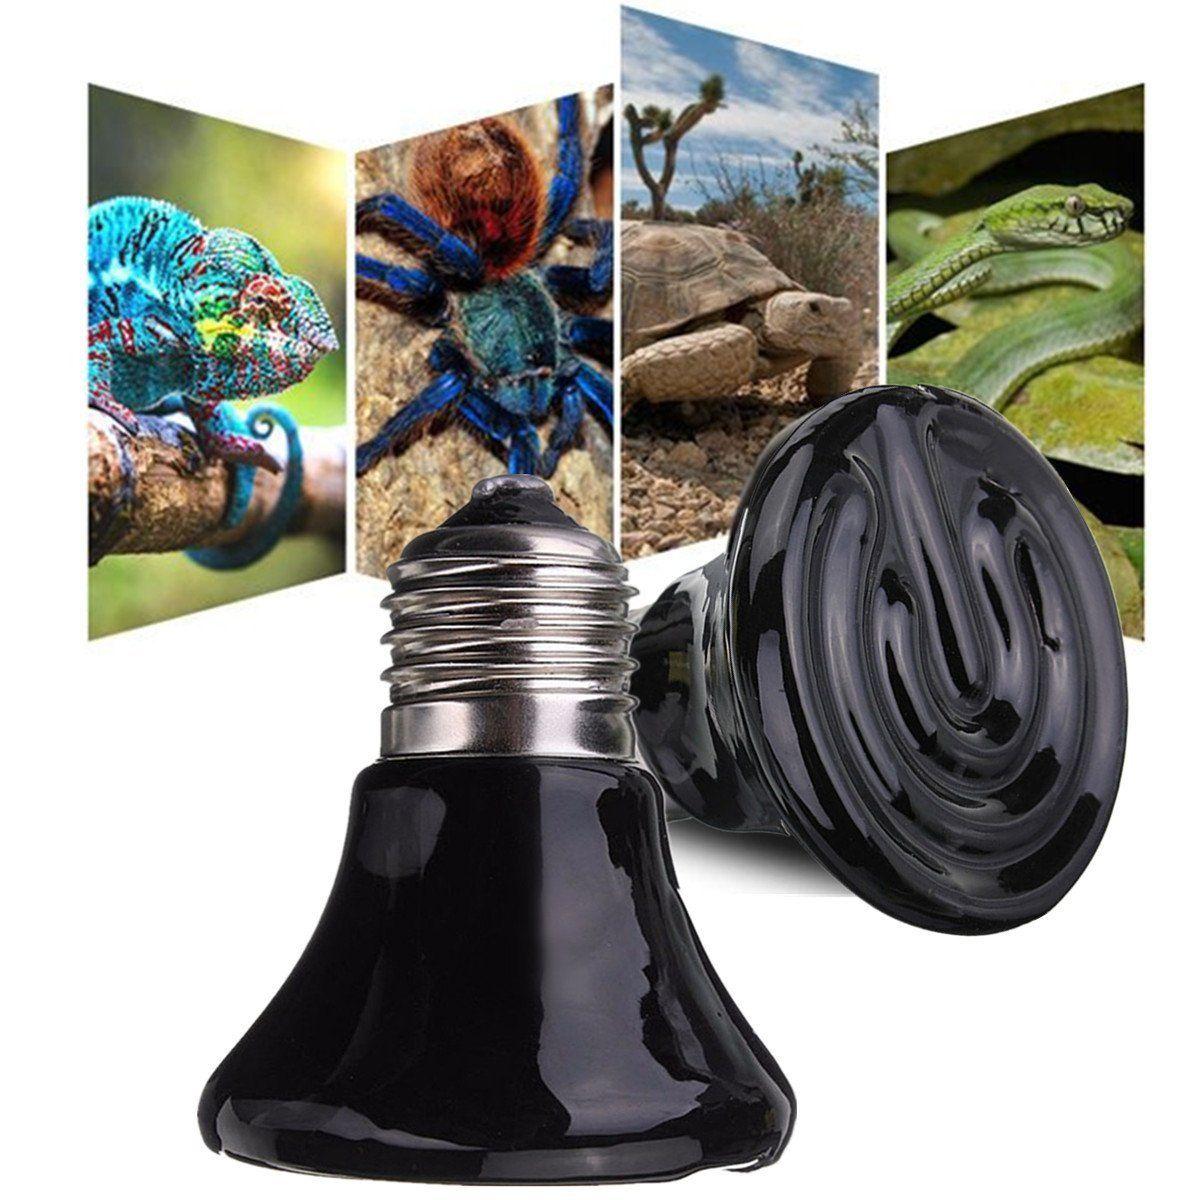 25W/50W/75W/100W/150W Mini Black Ceramic Heat Infrared Emitter Lamp Bulb Reptile Heat Lamp Pet Coop Brooder Grow Light Ceramic Heater